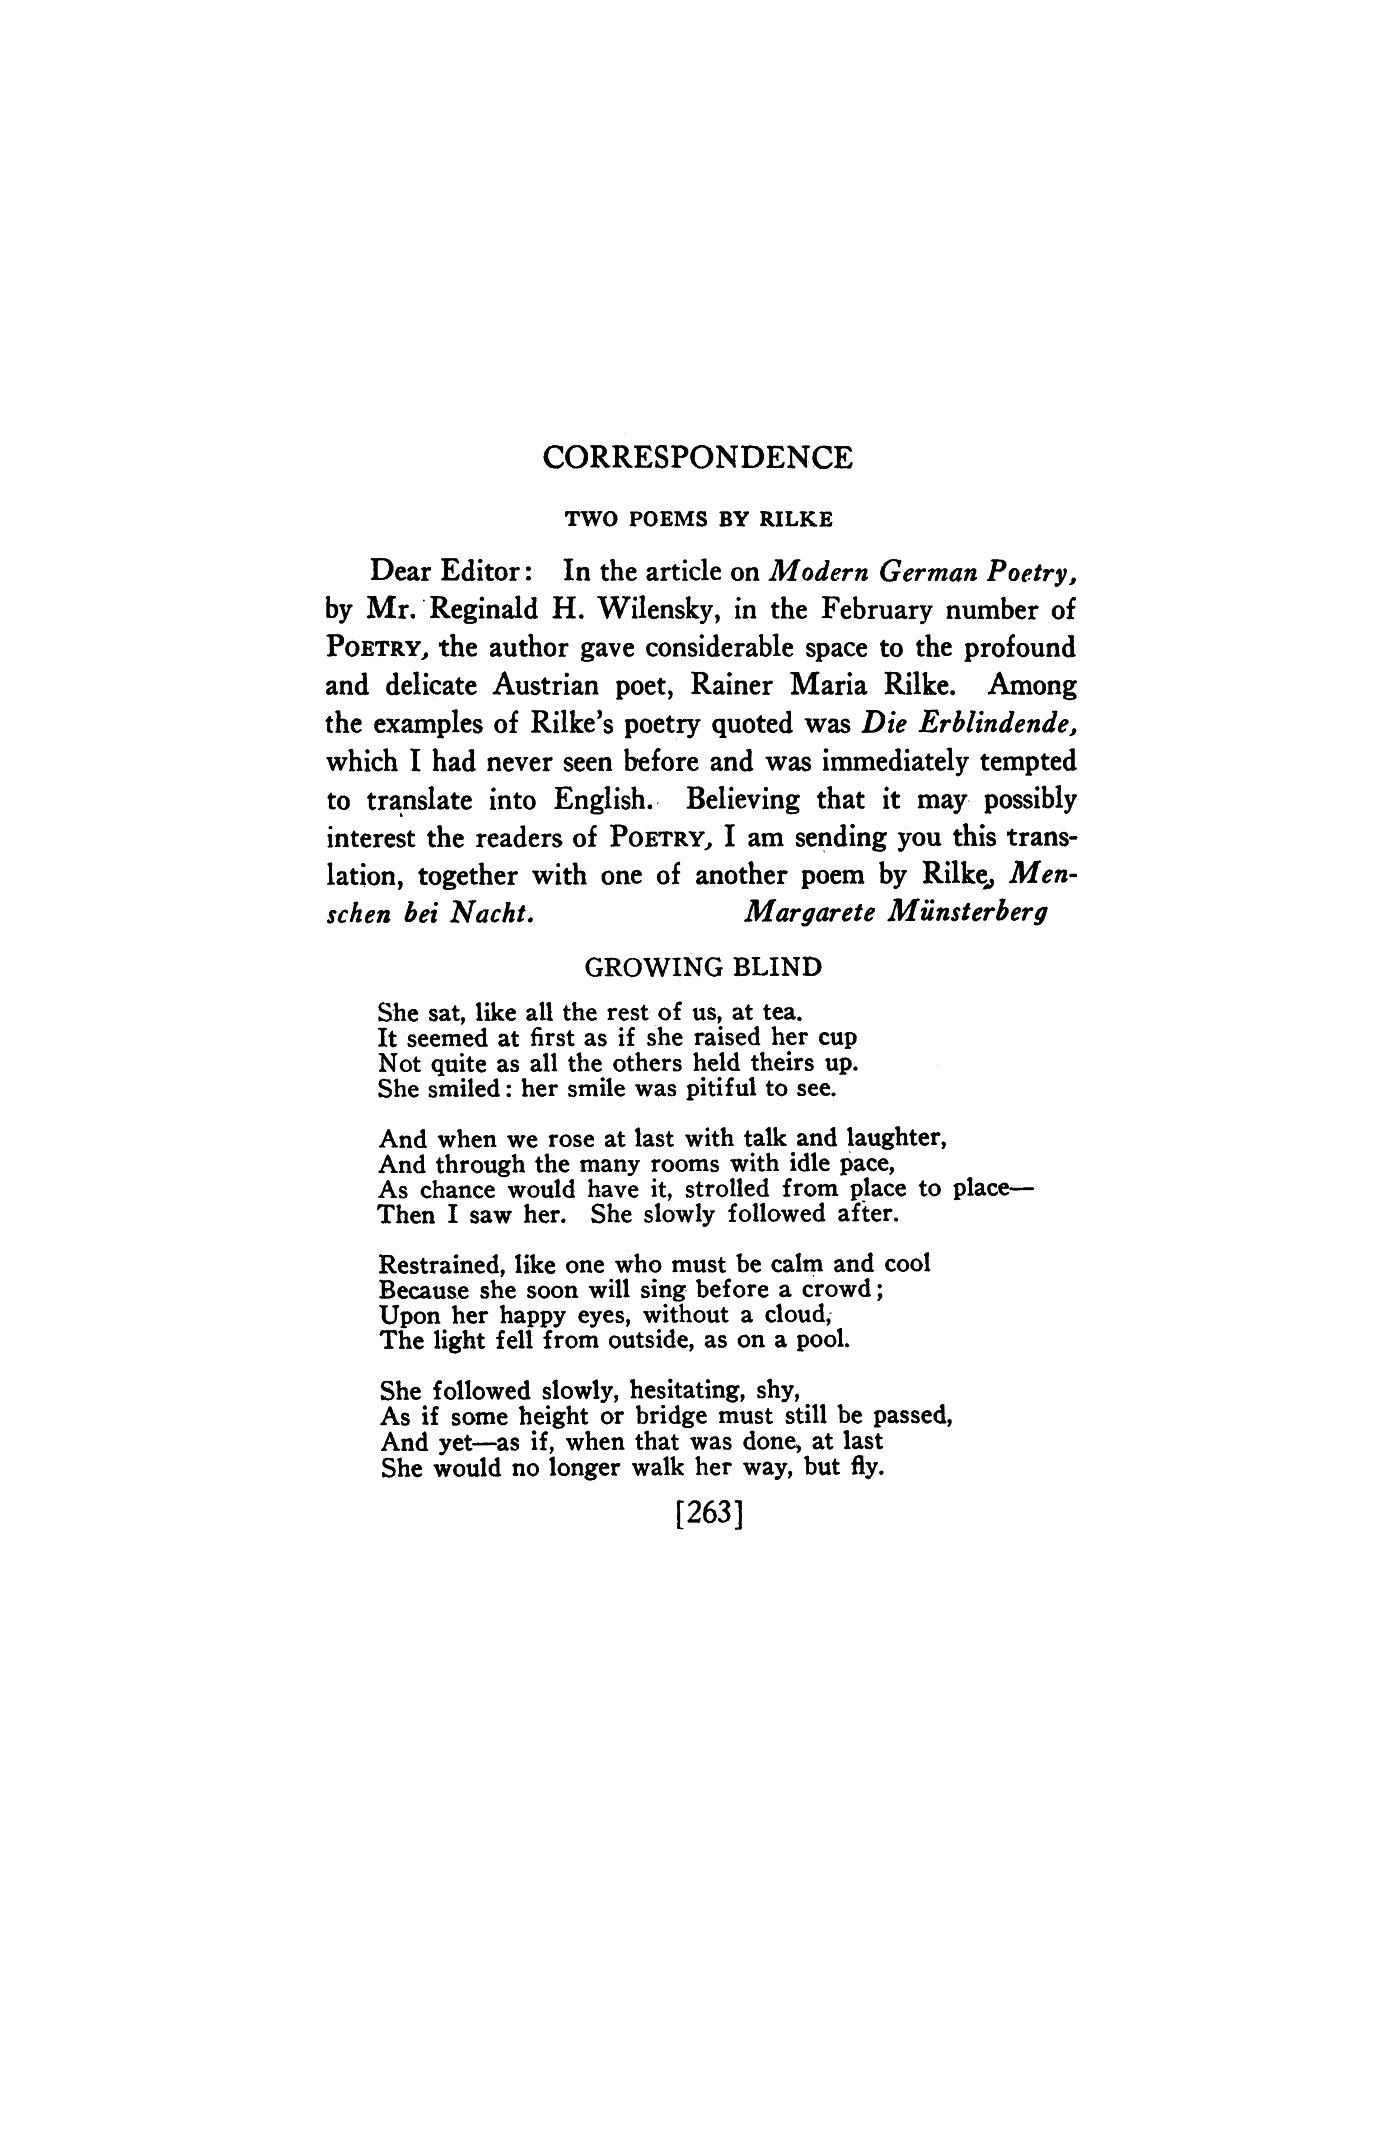 Correspondence: Two Poems by Rilke by Margarete Münsterberg